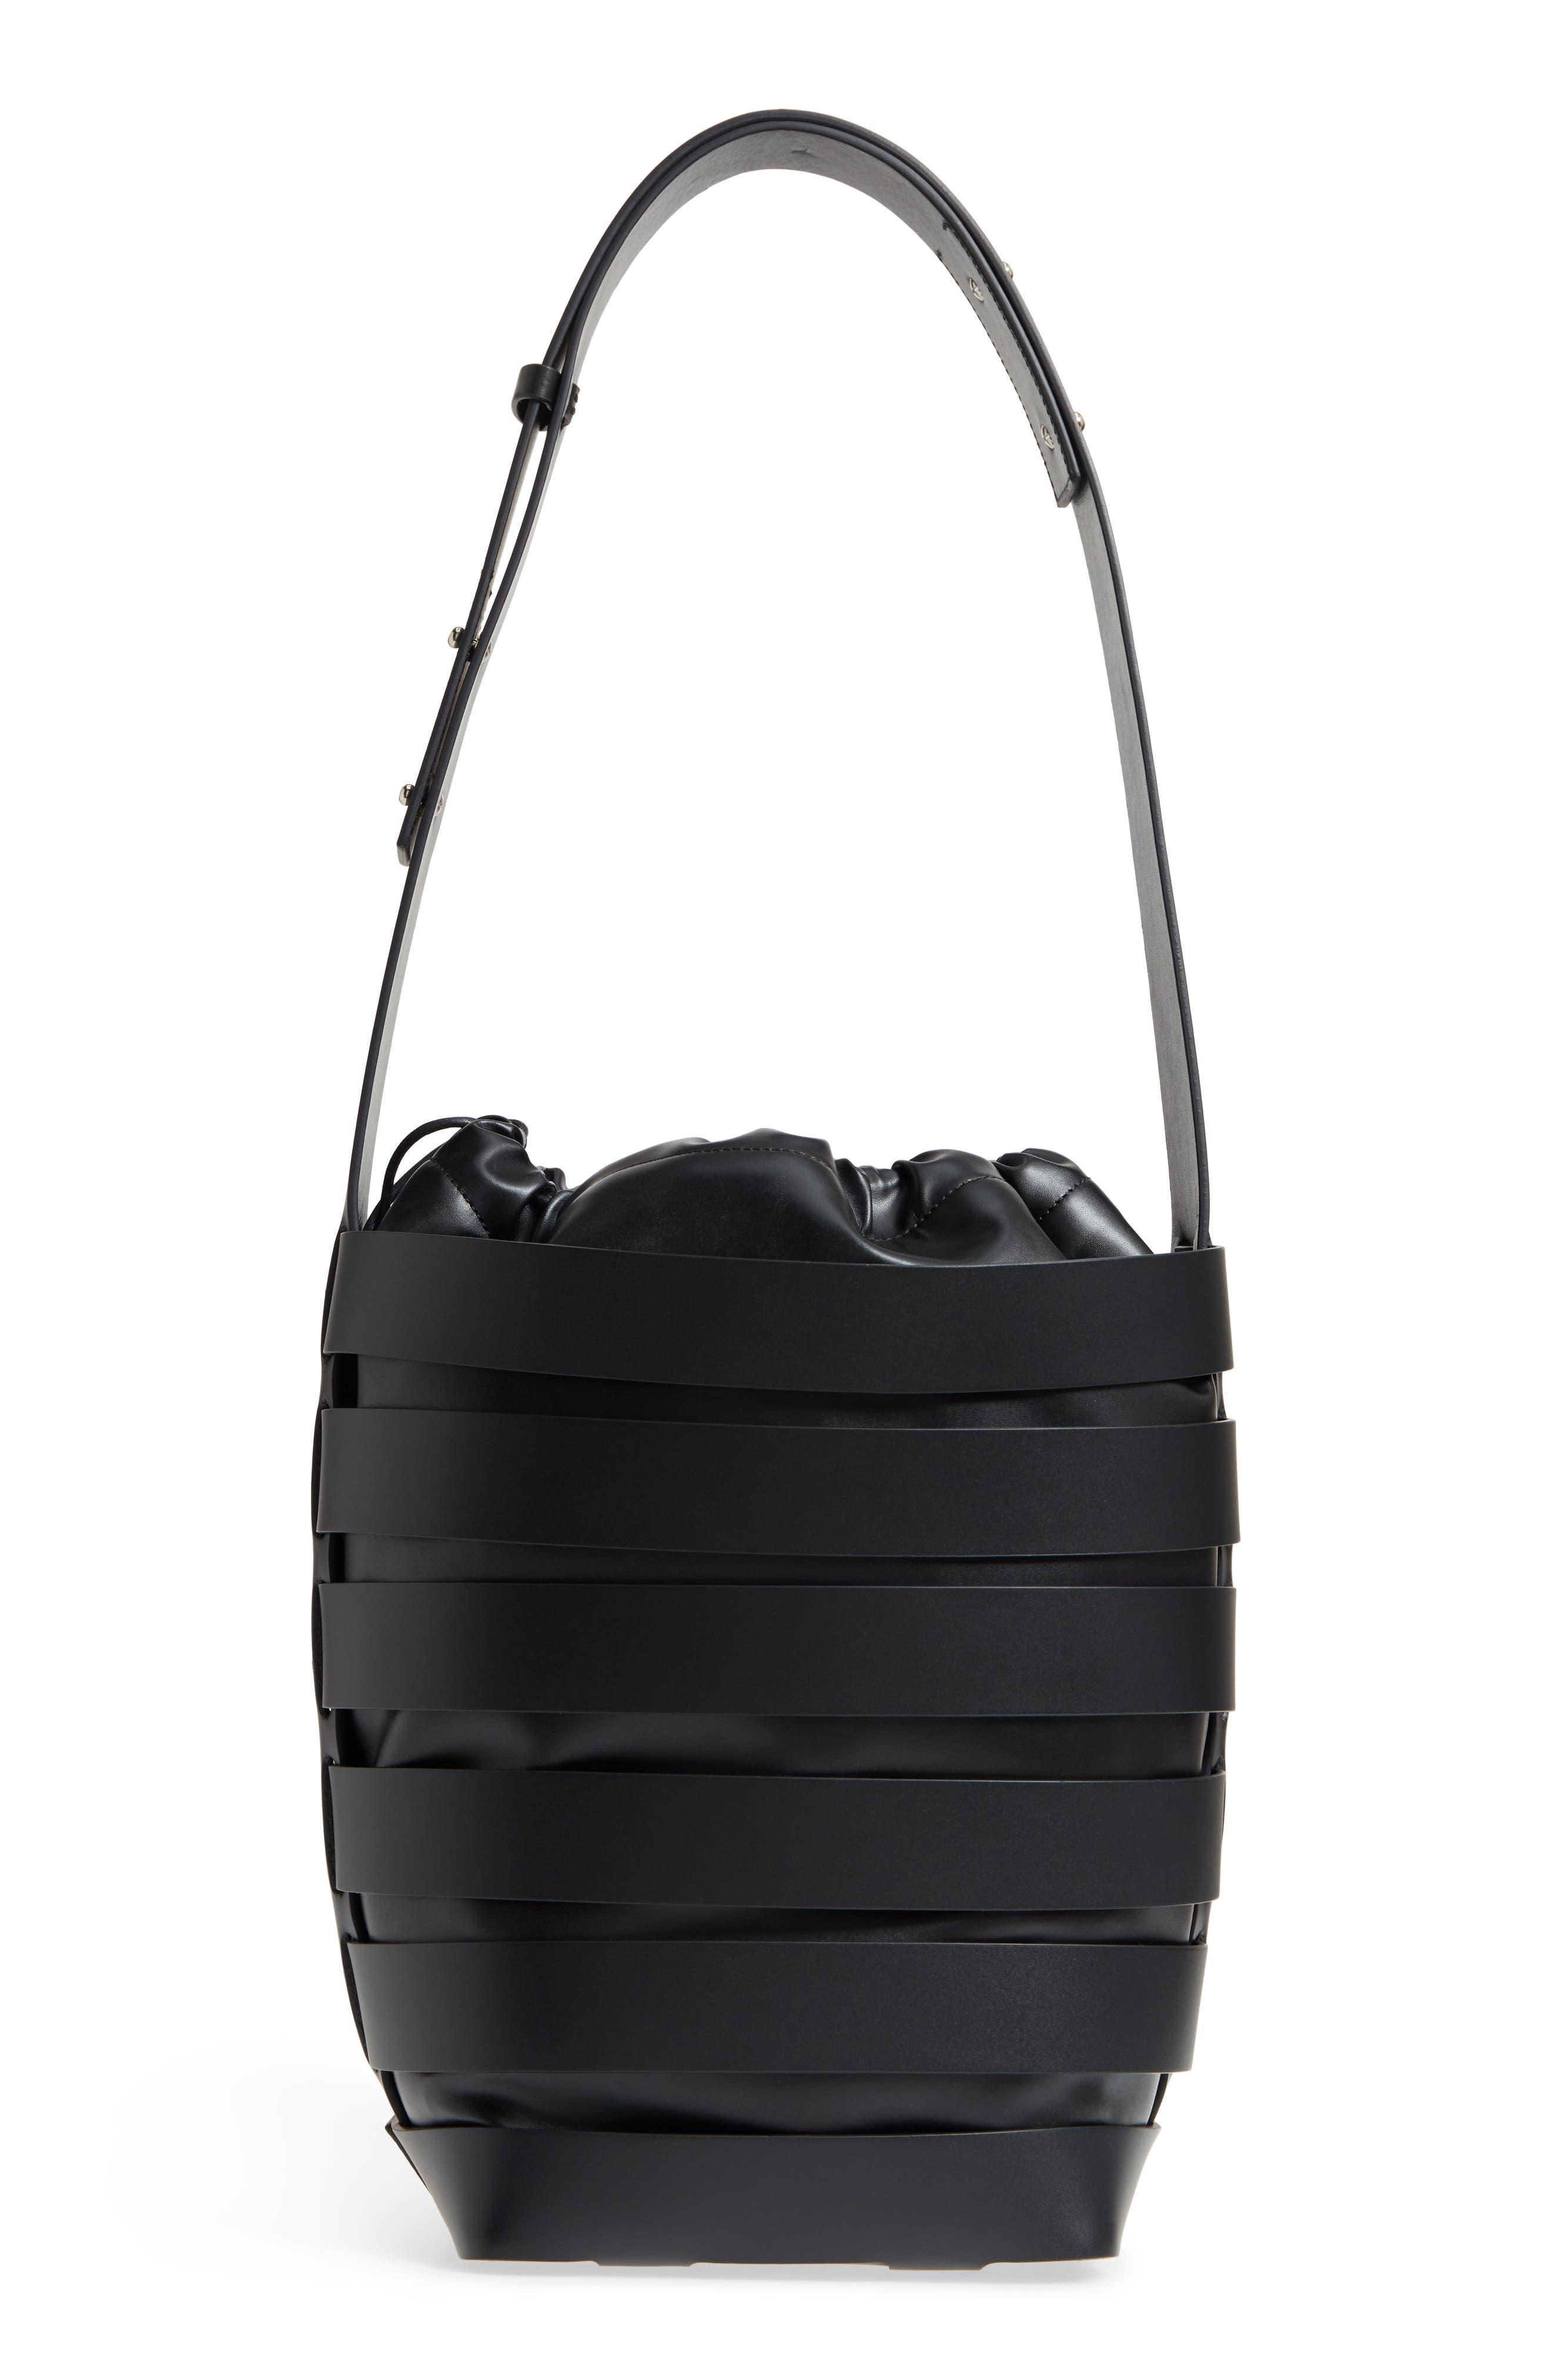 Medium Cage Leather Bucket Bag,                             Alternate thumbnail 3, color,                             001